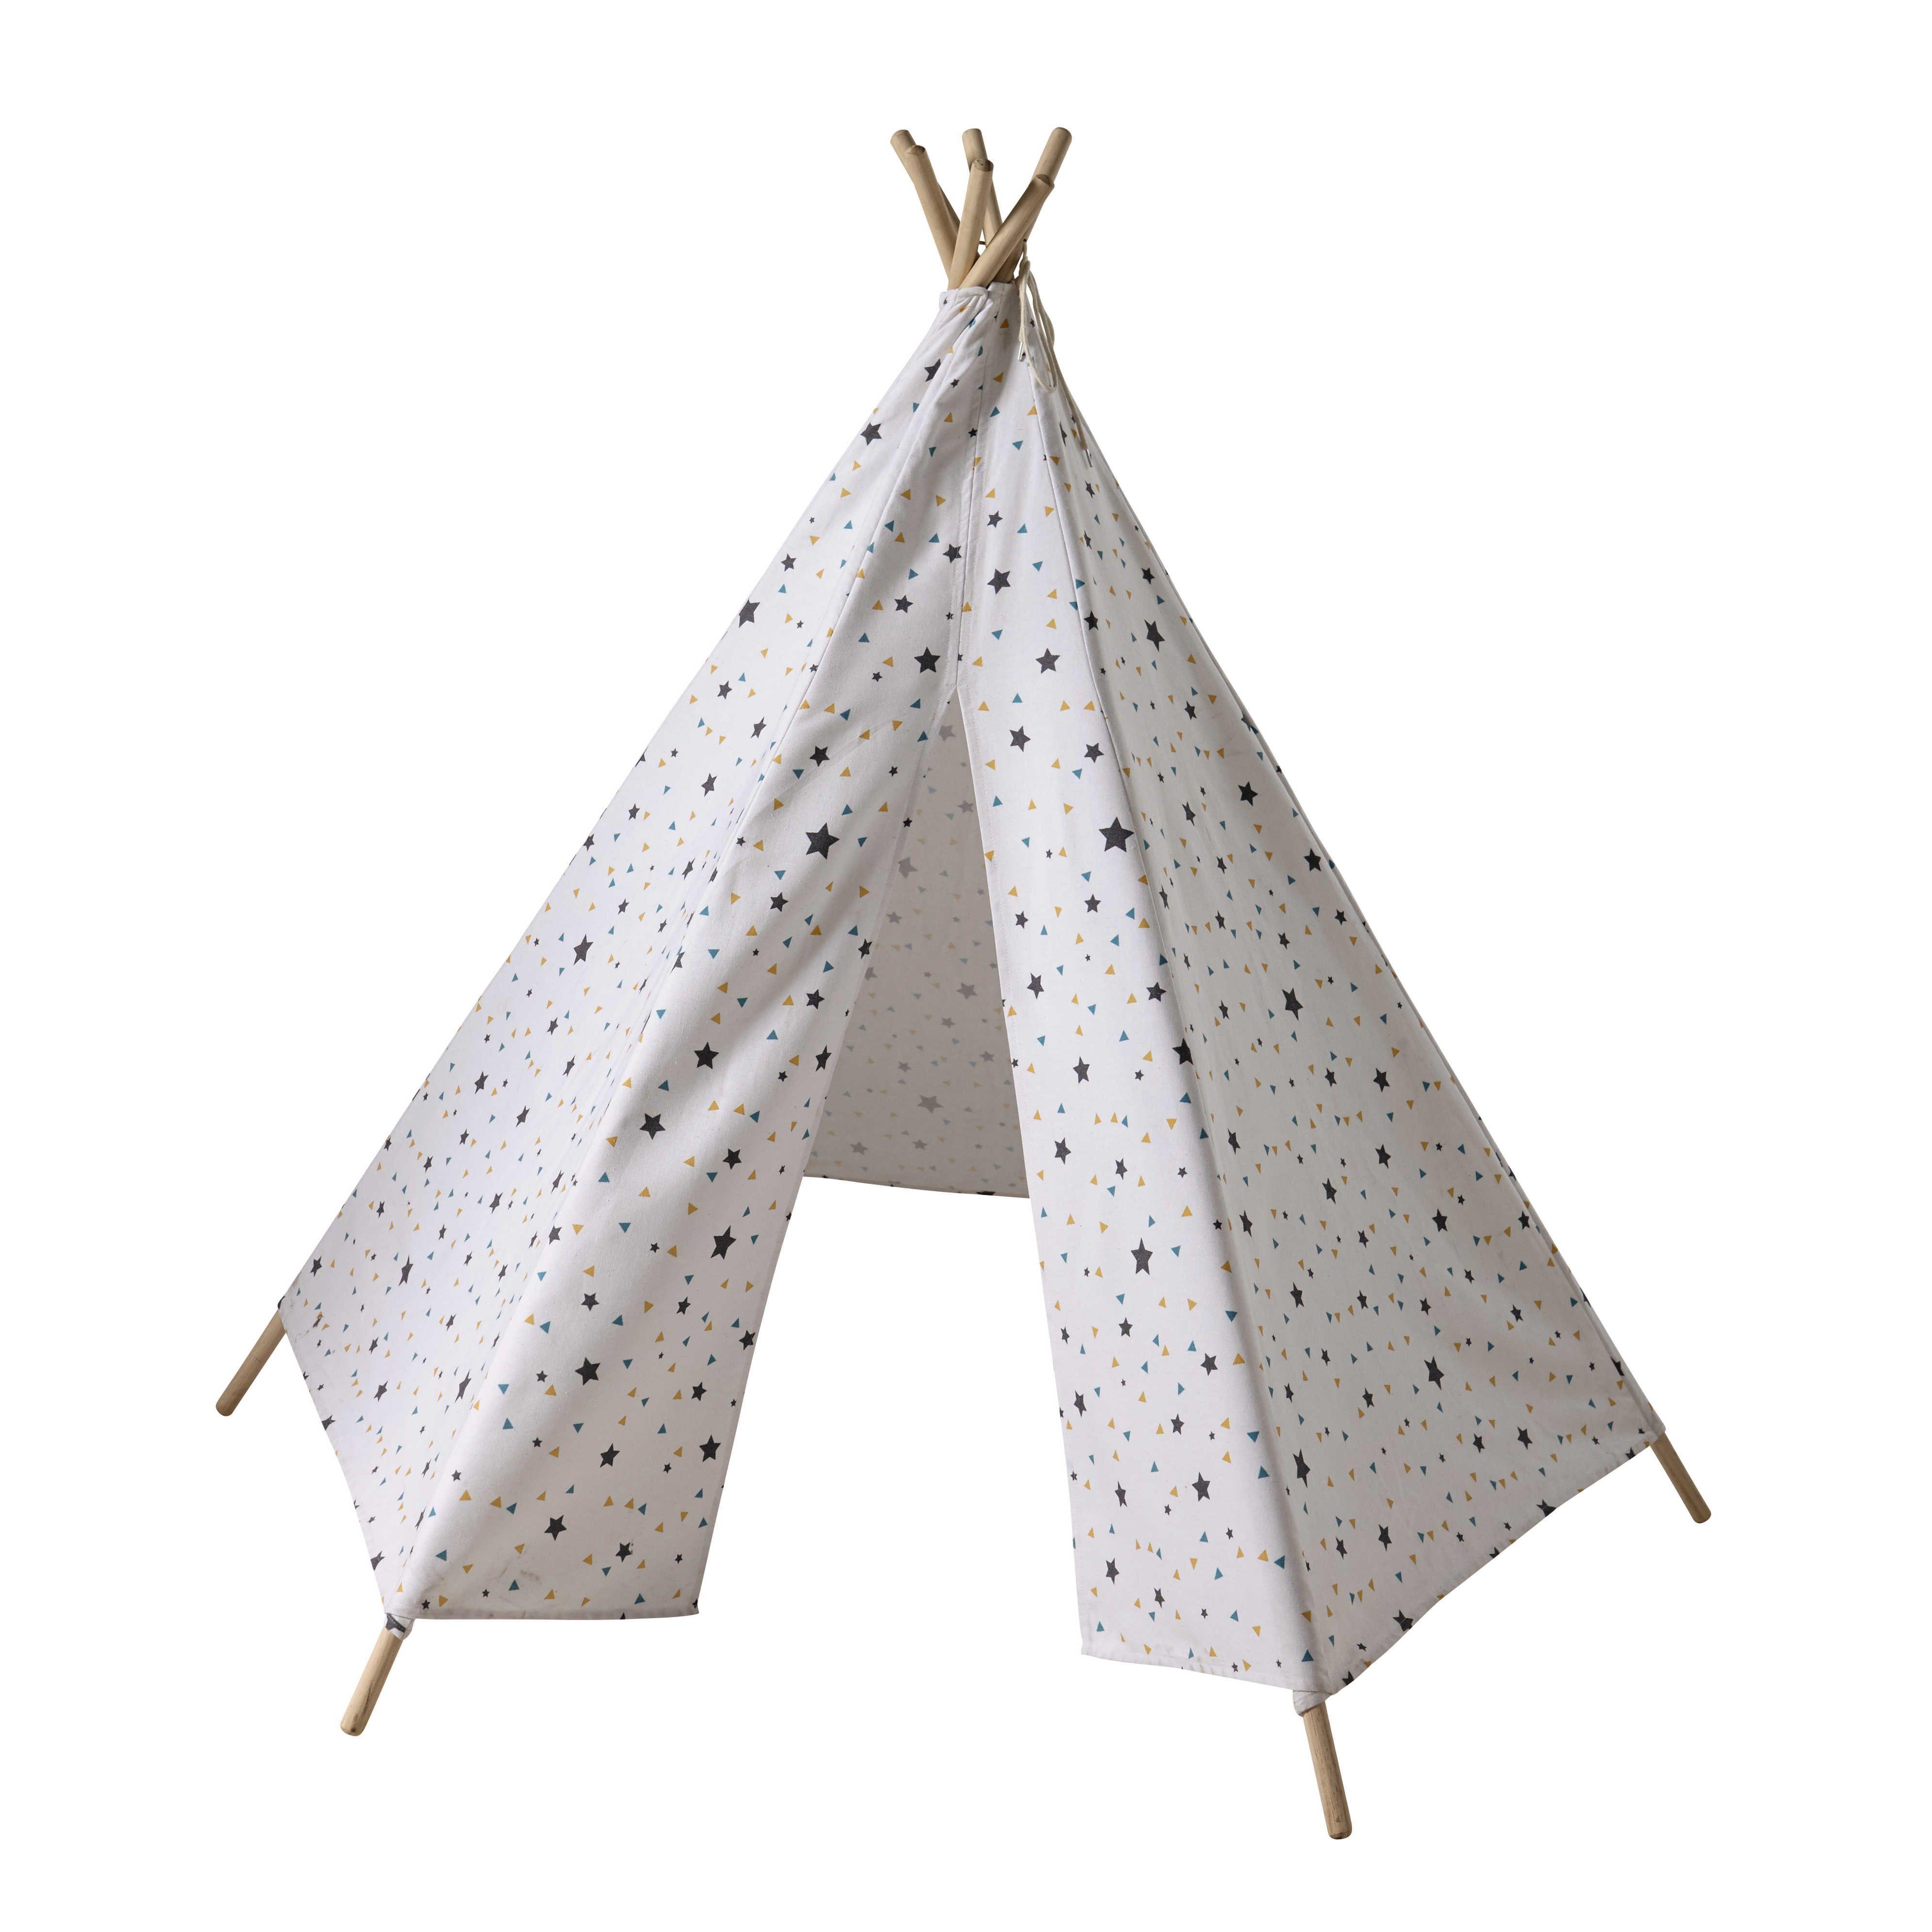 Tende Bambini Maison Du Monde.Tenda Indiana Per Bambini Con Motivi A Triangoli E Stelle For My